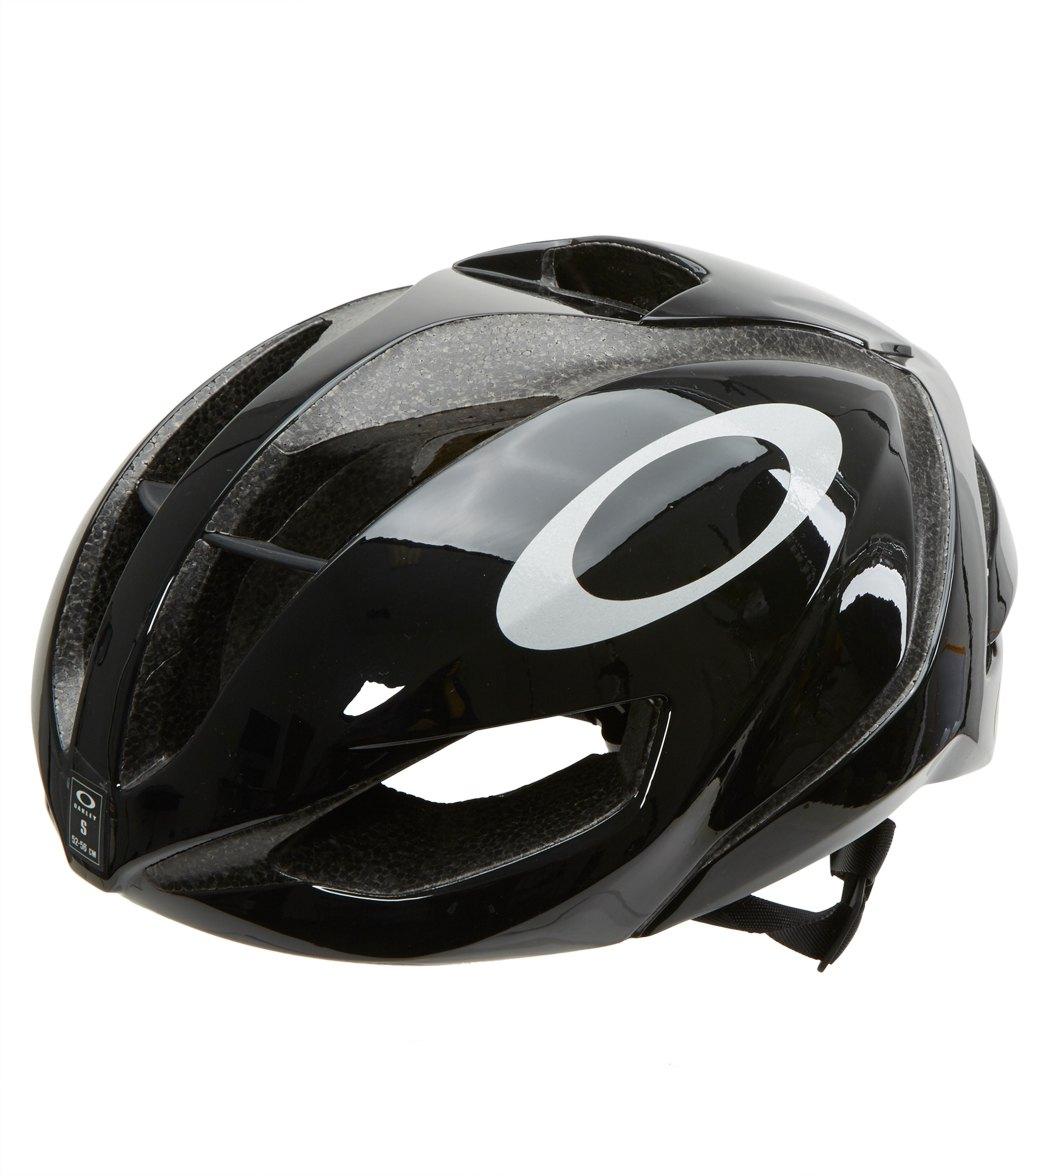 e465392fc61 Oakley Men s ARO5 Cycling Helmet at SwimOutlet.com - Free Shipping